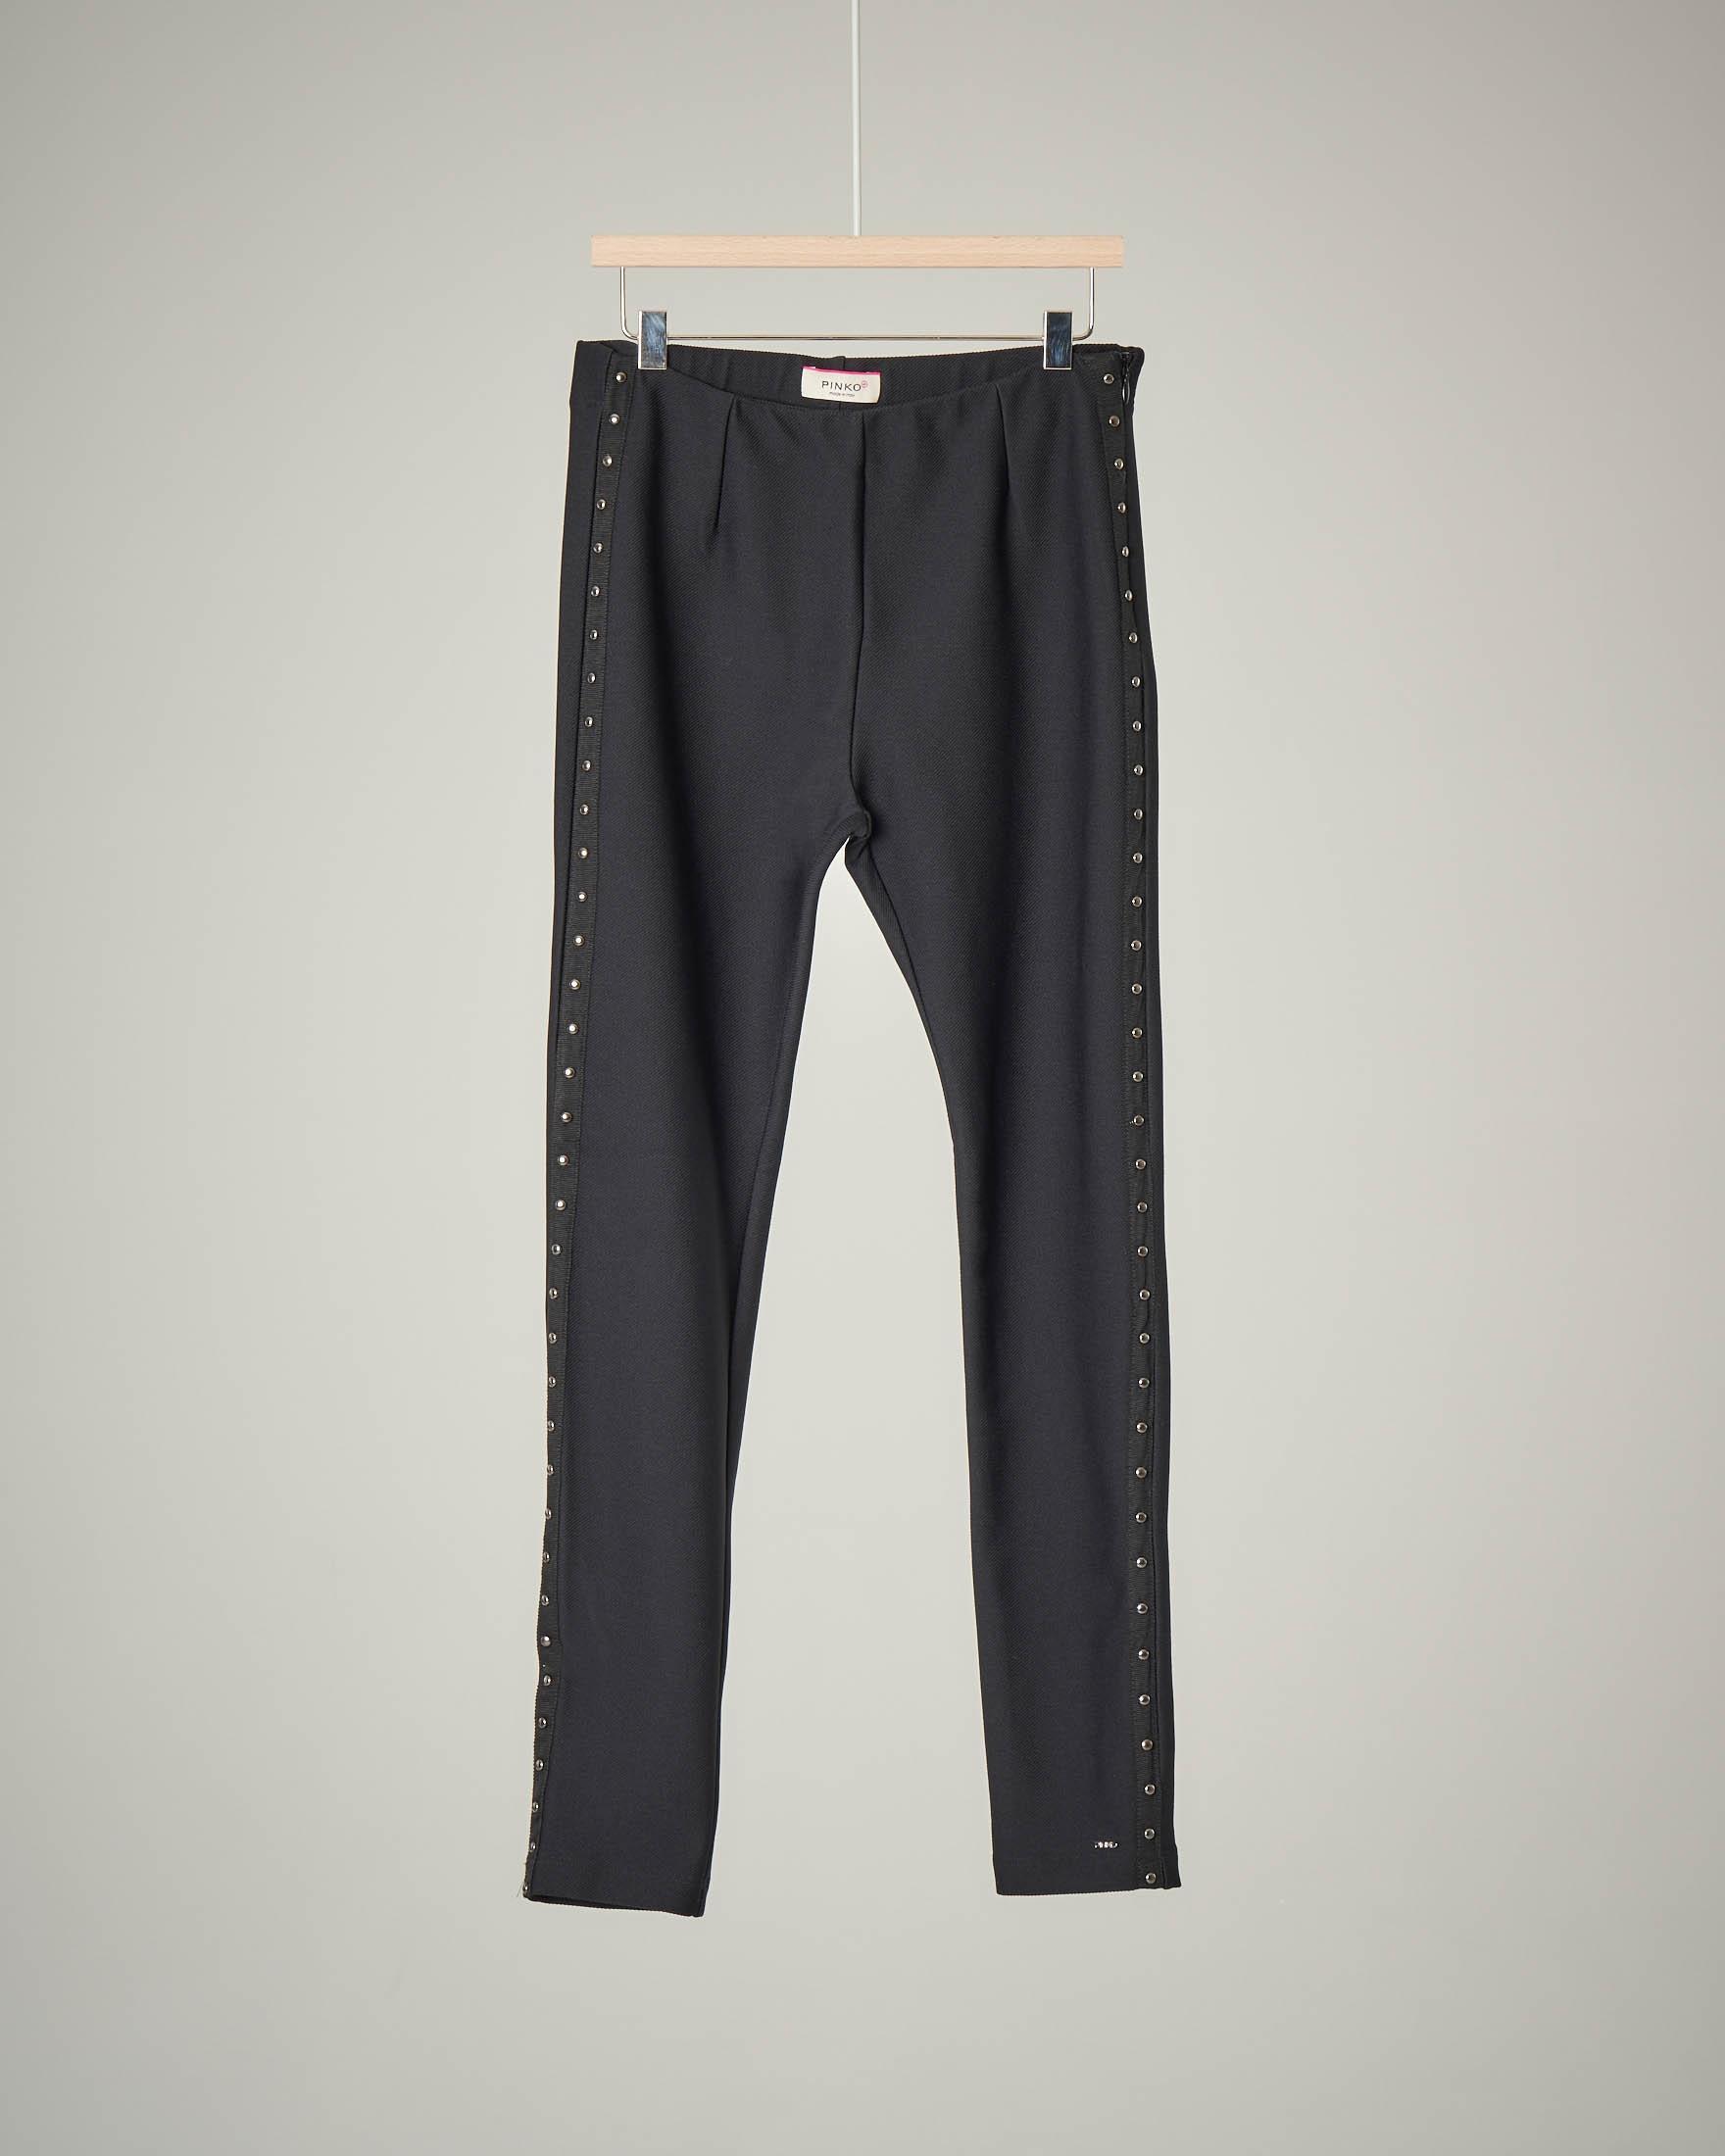 Pantalone nero borchie